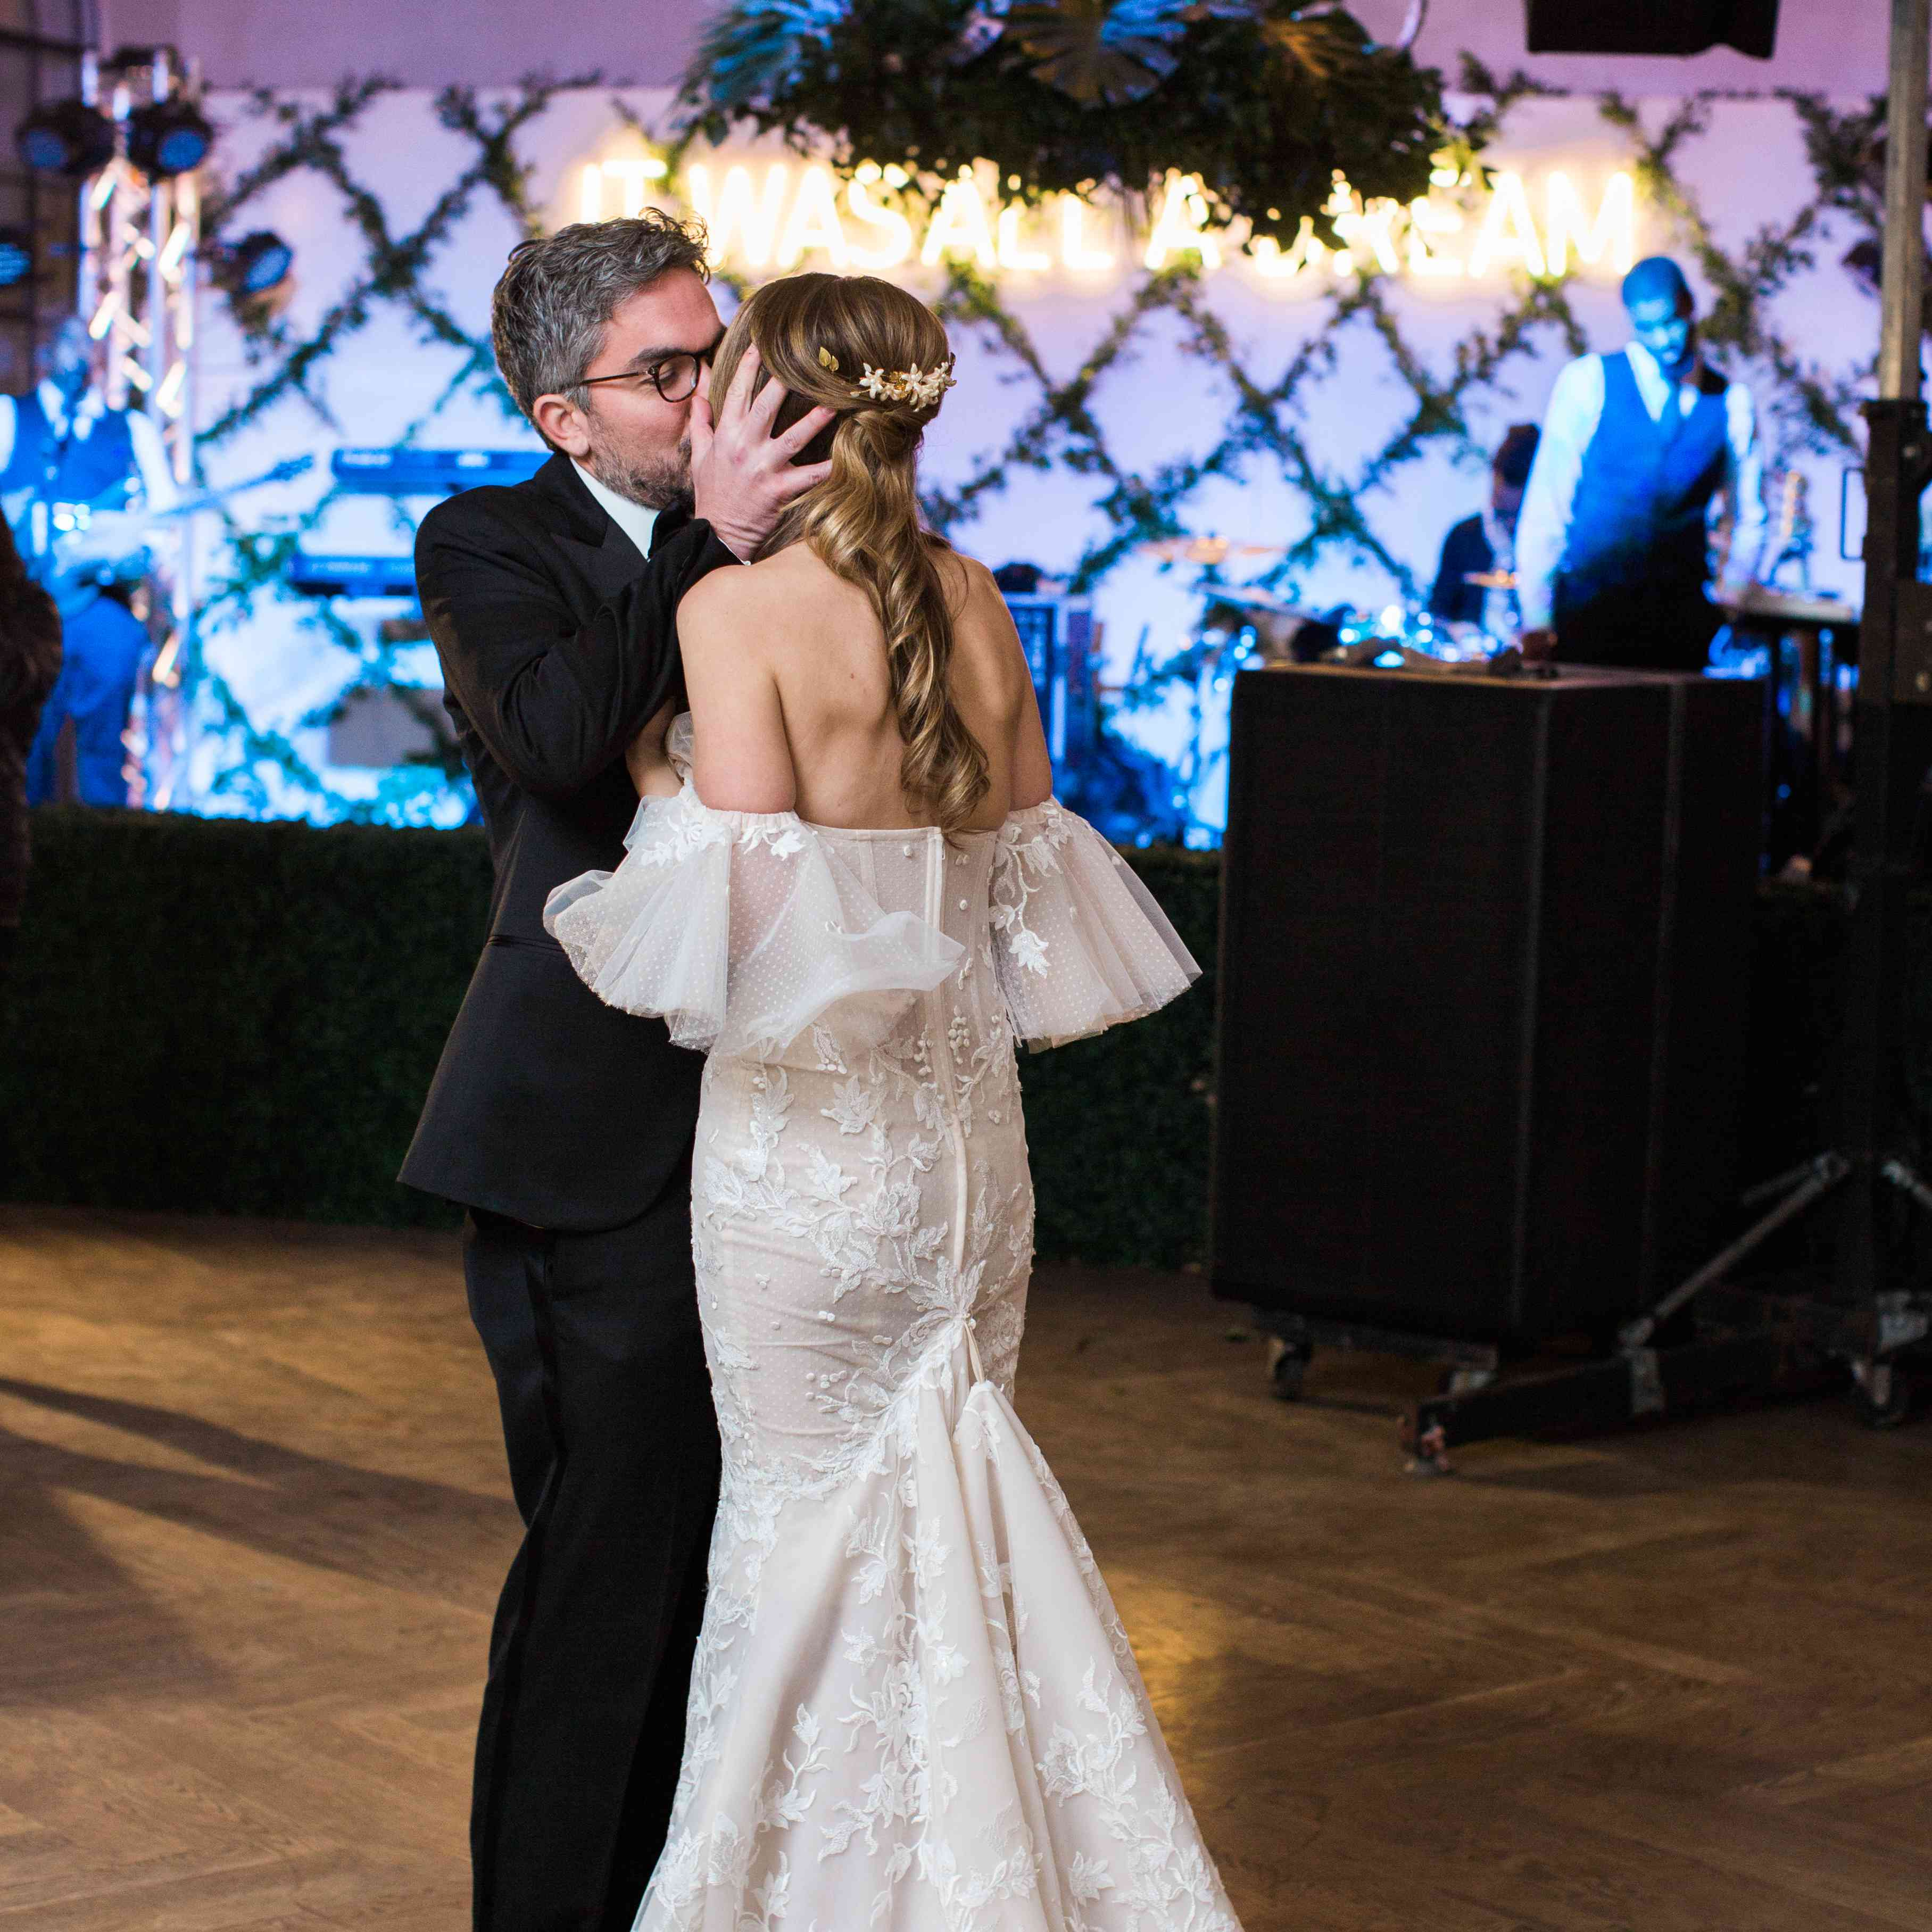 <p>wedding first dance</p><br><br>